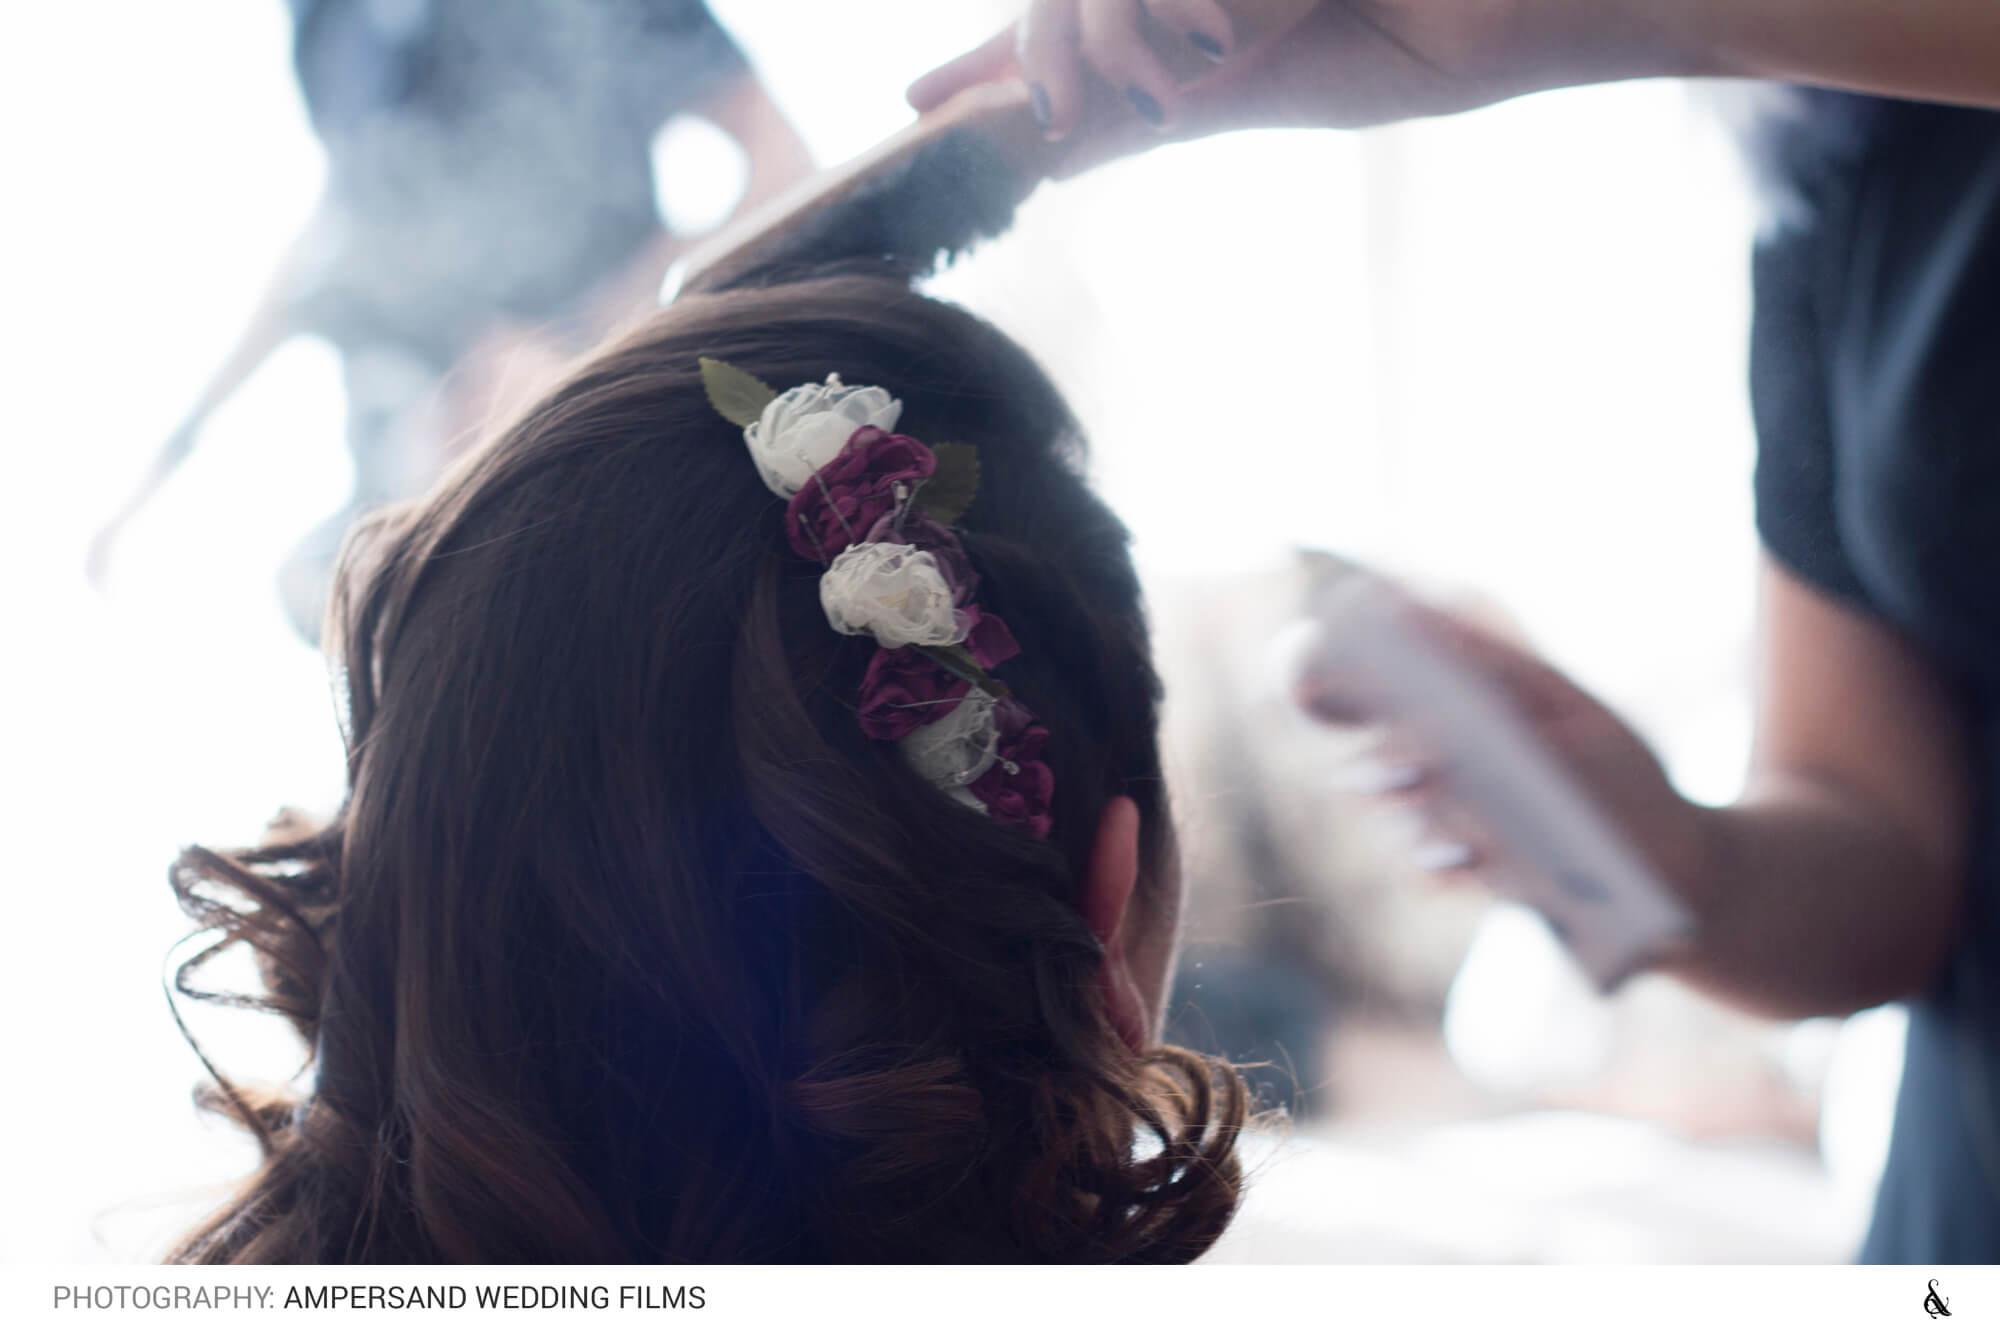 Peinado de novia - Matrimonio Pía & Juan Pablo en Campus Oriente